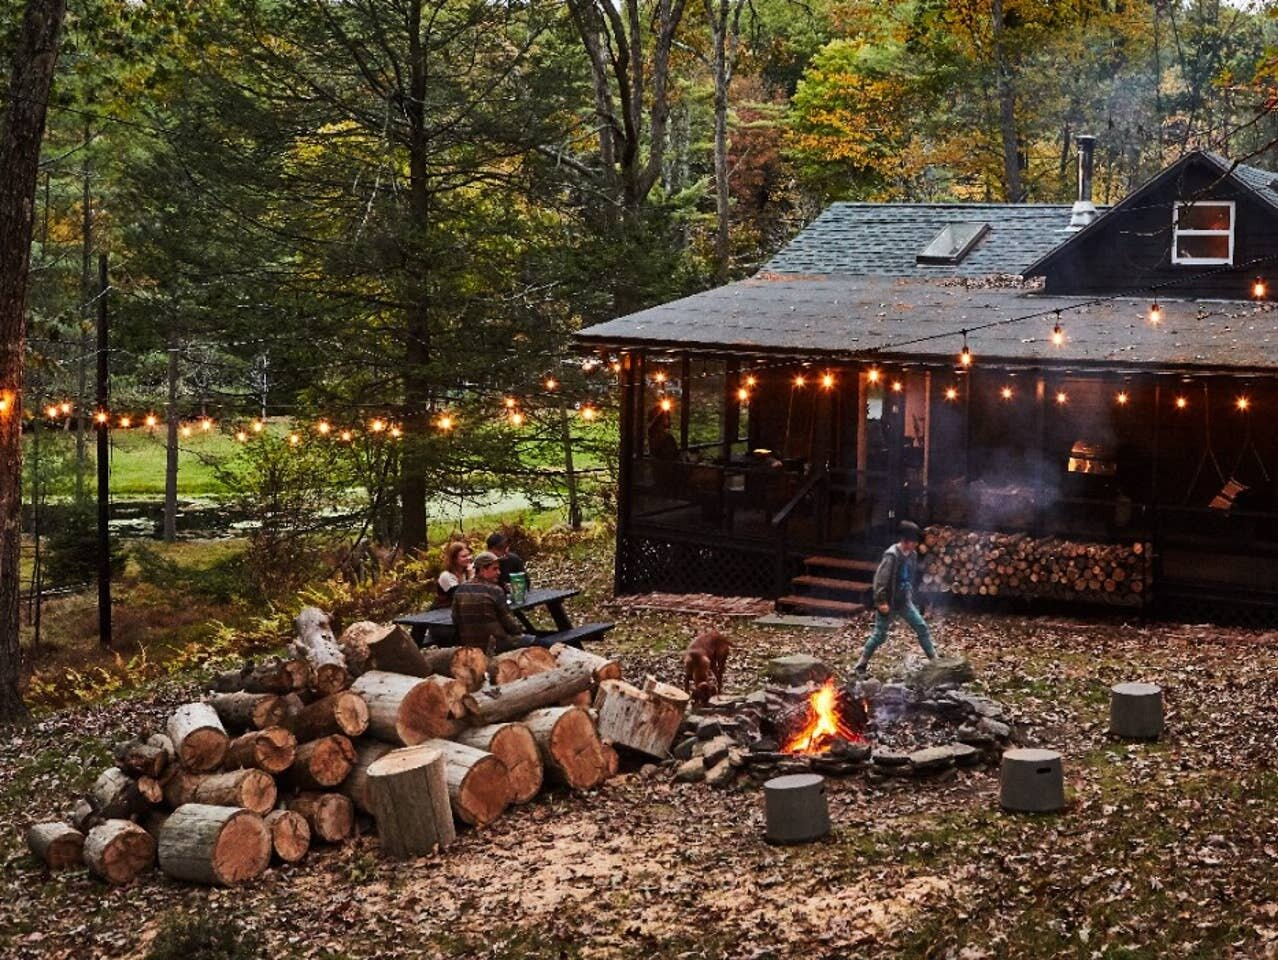 Highland Bungalow by Lauren Wesley Spear backyard fire pit